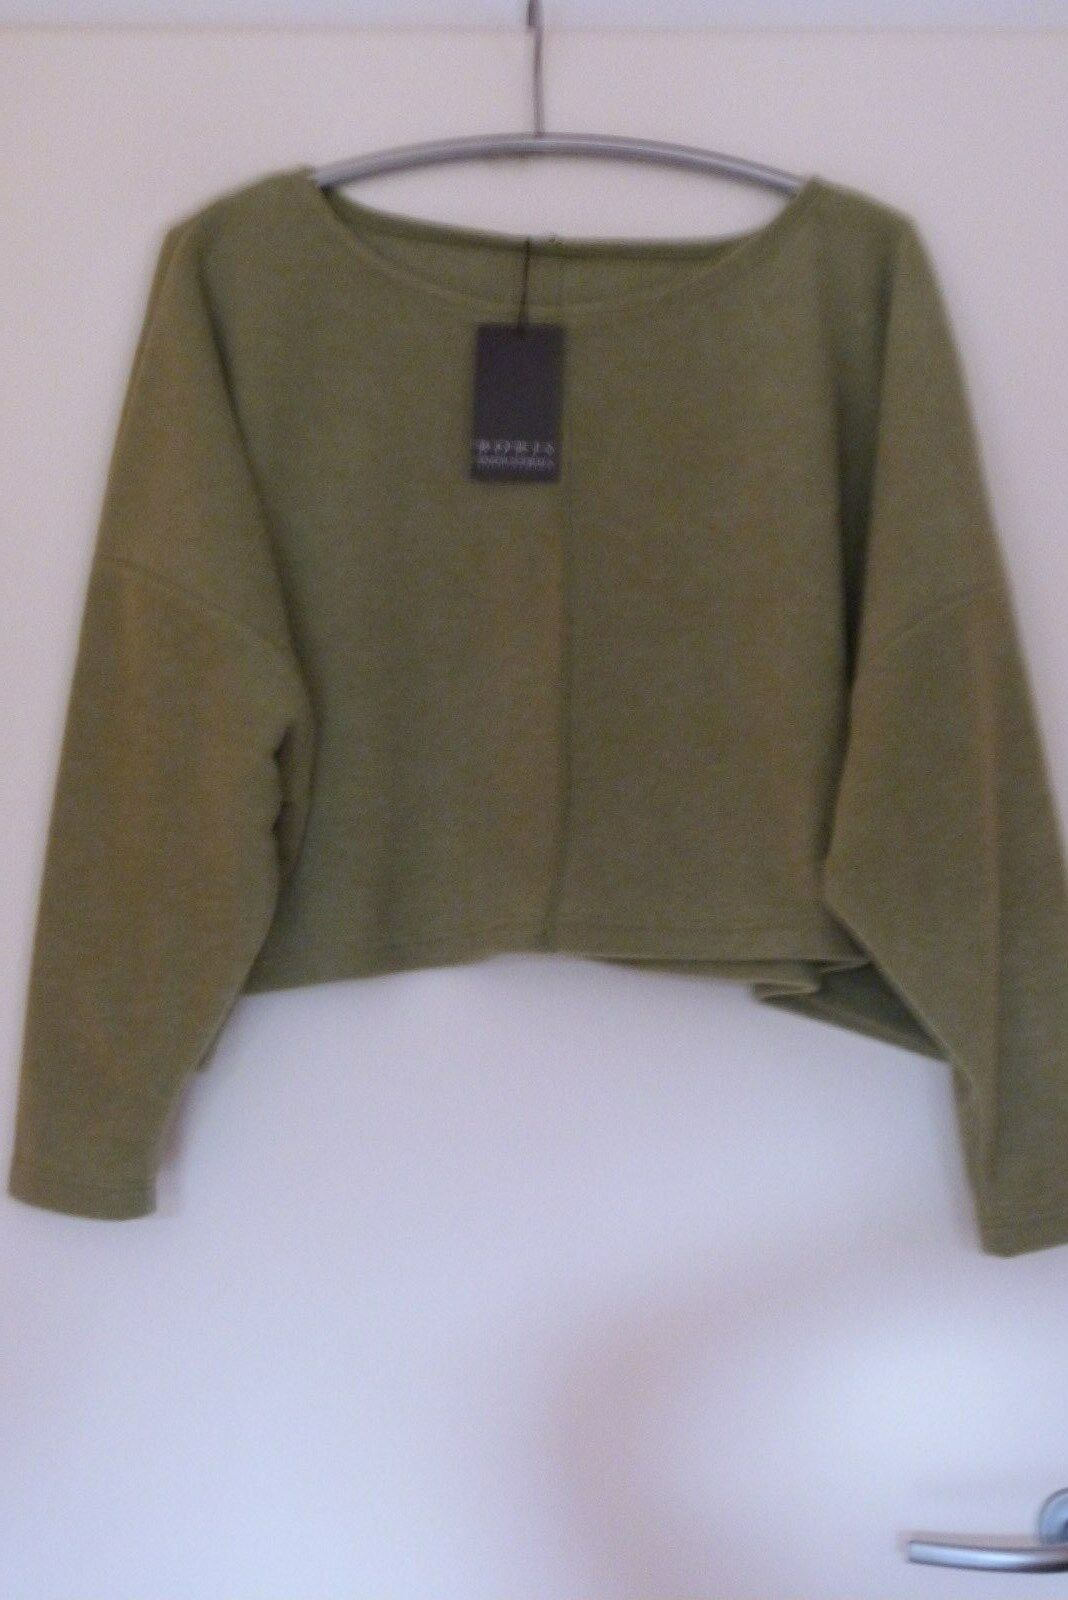 Boris Industries sweat shirt in pile pile pile 46-54 CE Nuovo  verde kastig 92 cm Lagenlook 8643c5